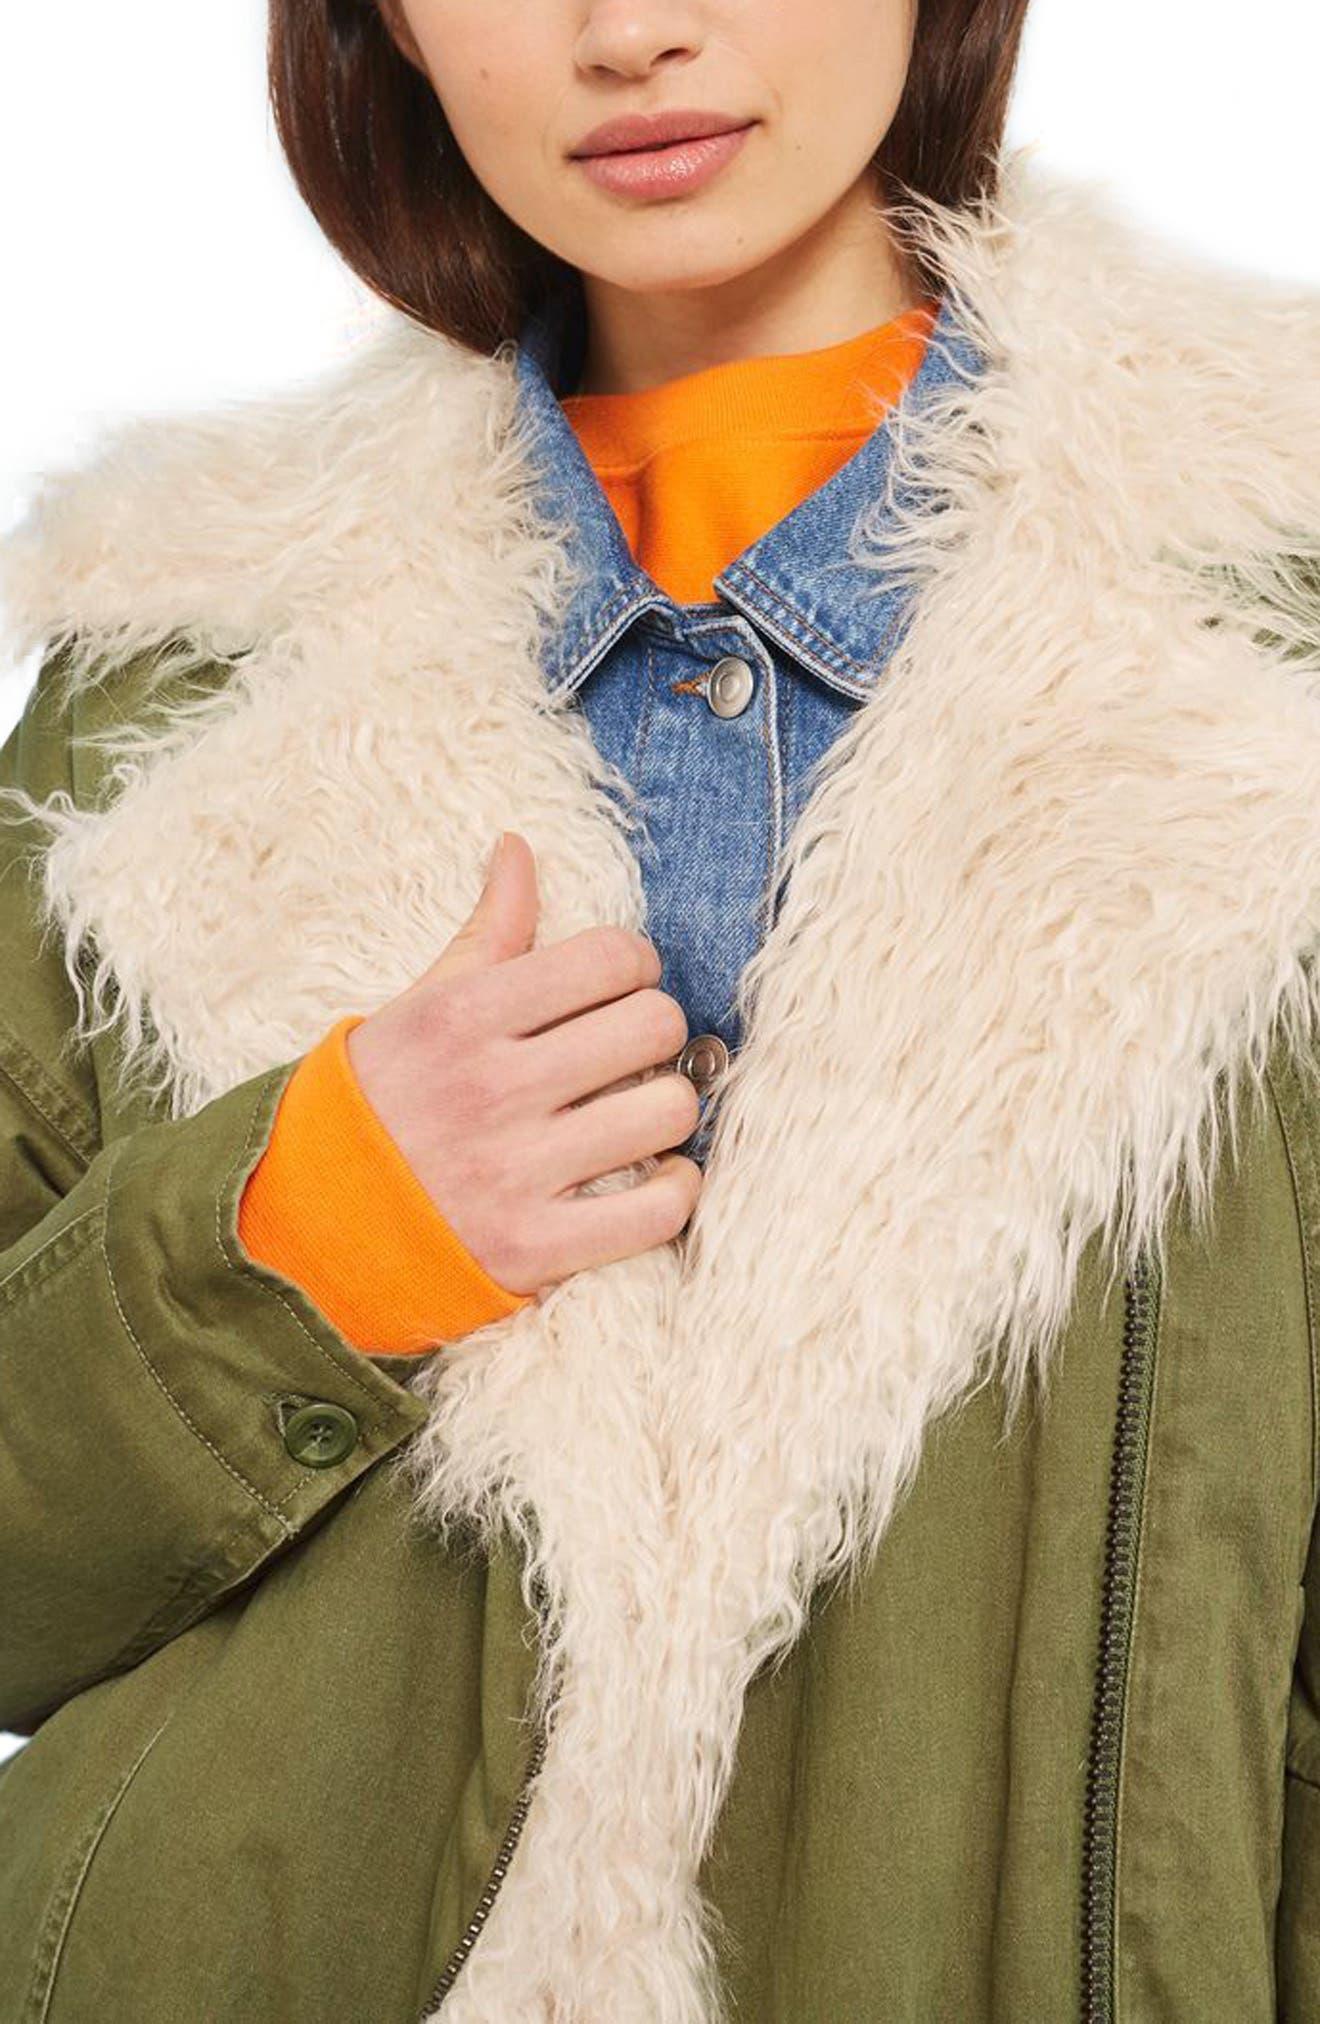 Jake Faux Fur Lined Jacket,                             Main thumbnail 1, color,